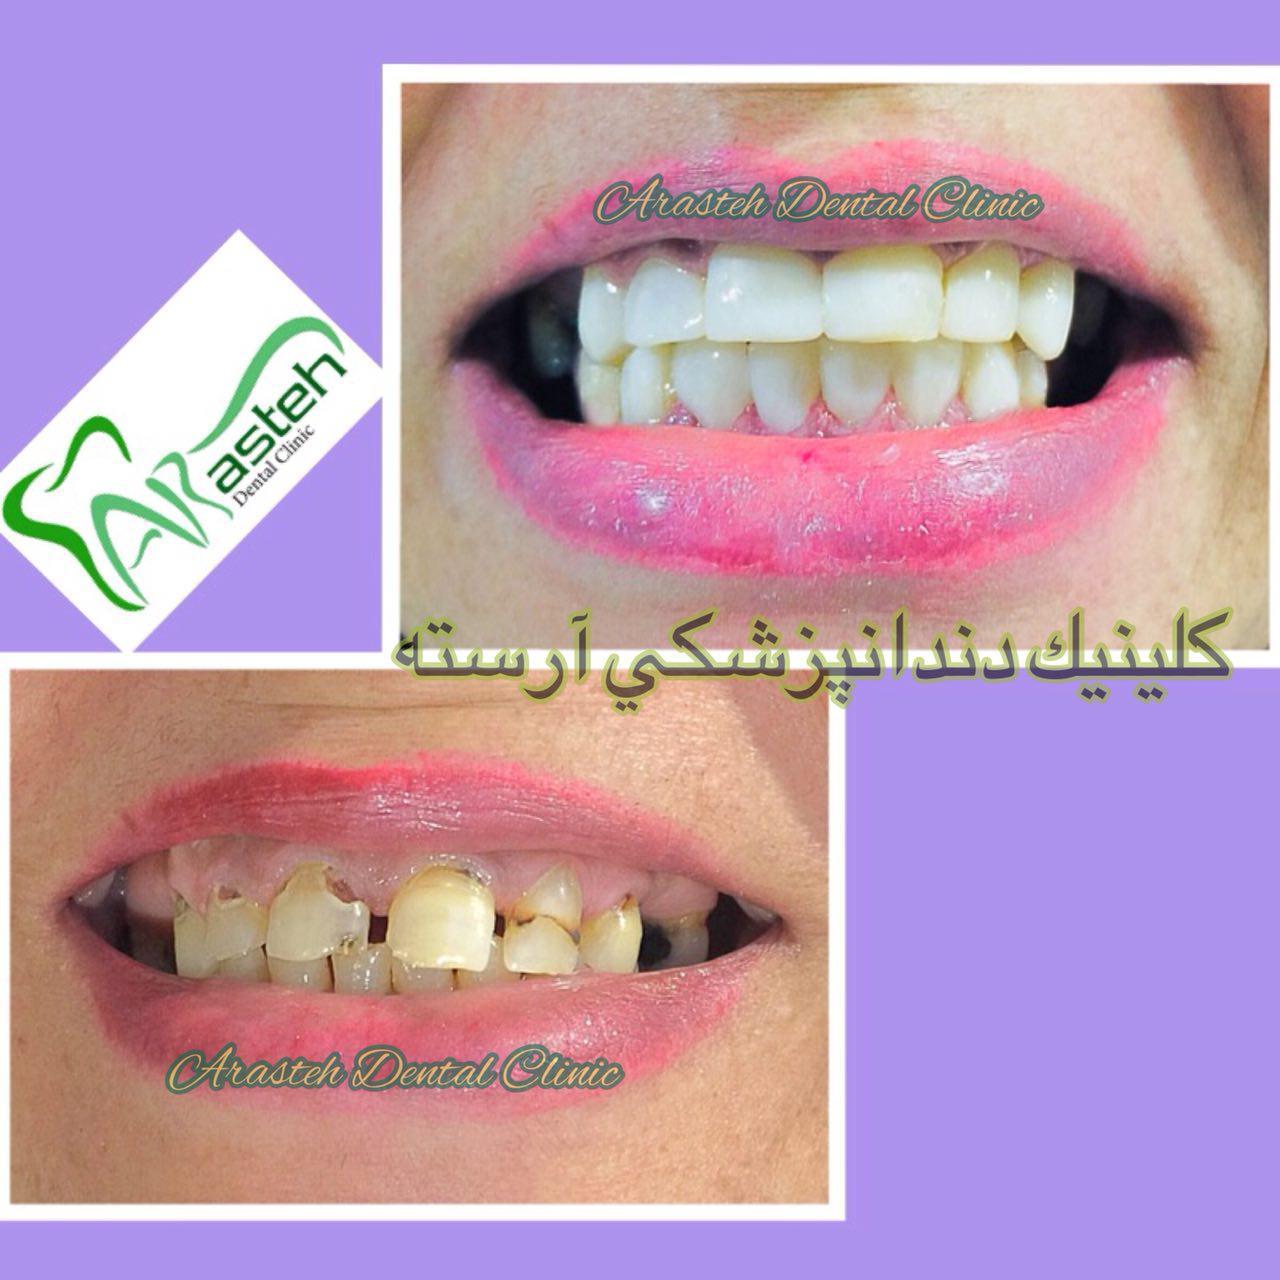 زیبا بخند تصاویر قبل و بعد دندانپزشکی،قبل و بعد،before and after قبل و بعد درمان clinicarasteh4